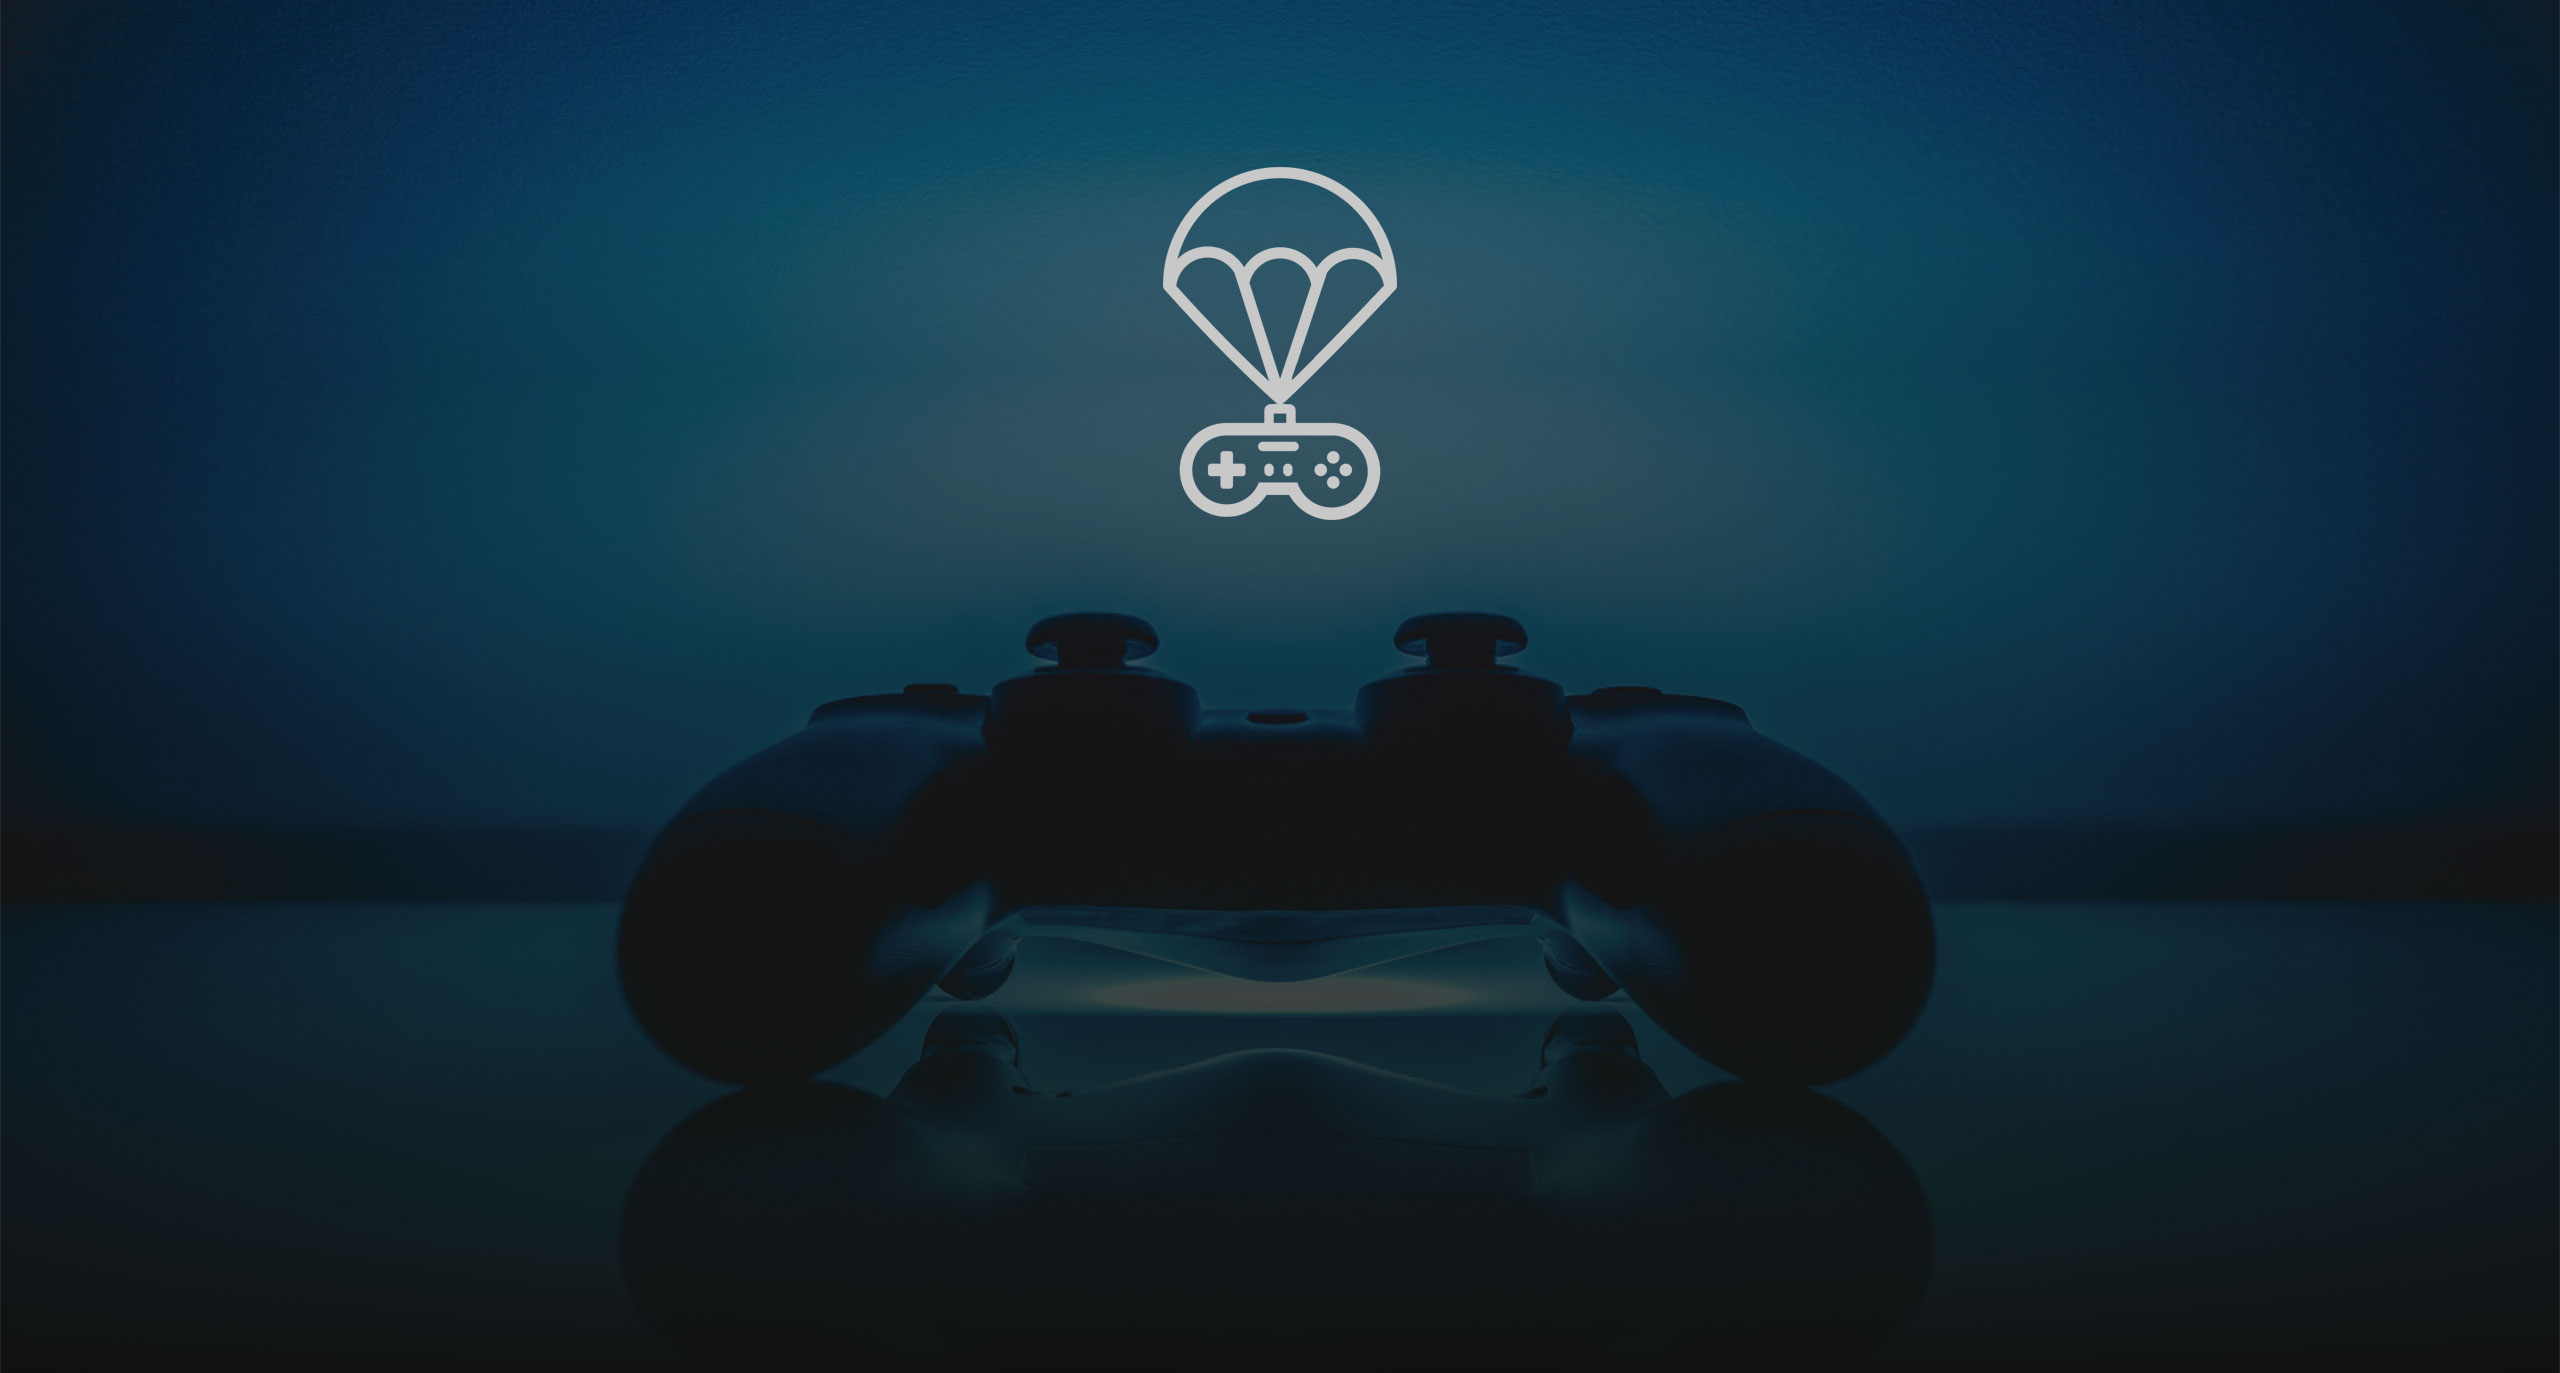 Brand Identity for Playdrop